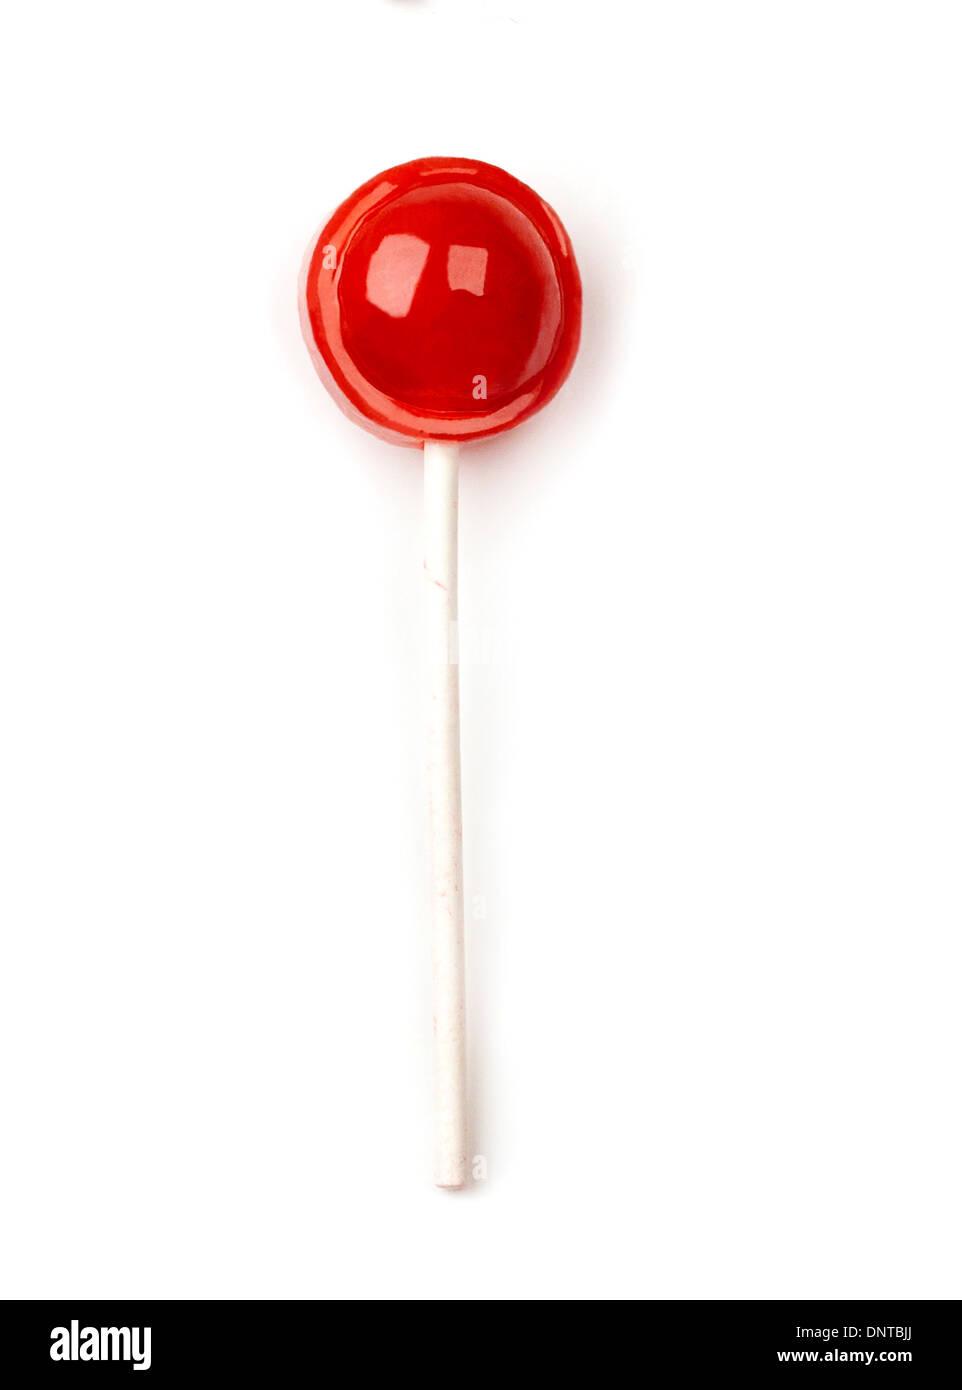 Single unwrapped tootsie roll pop - Stock Image